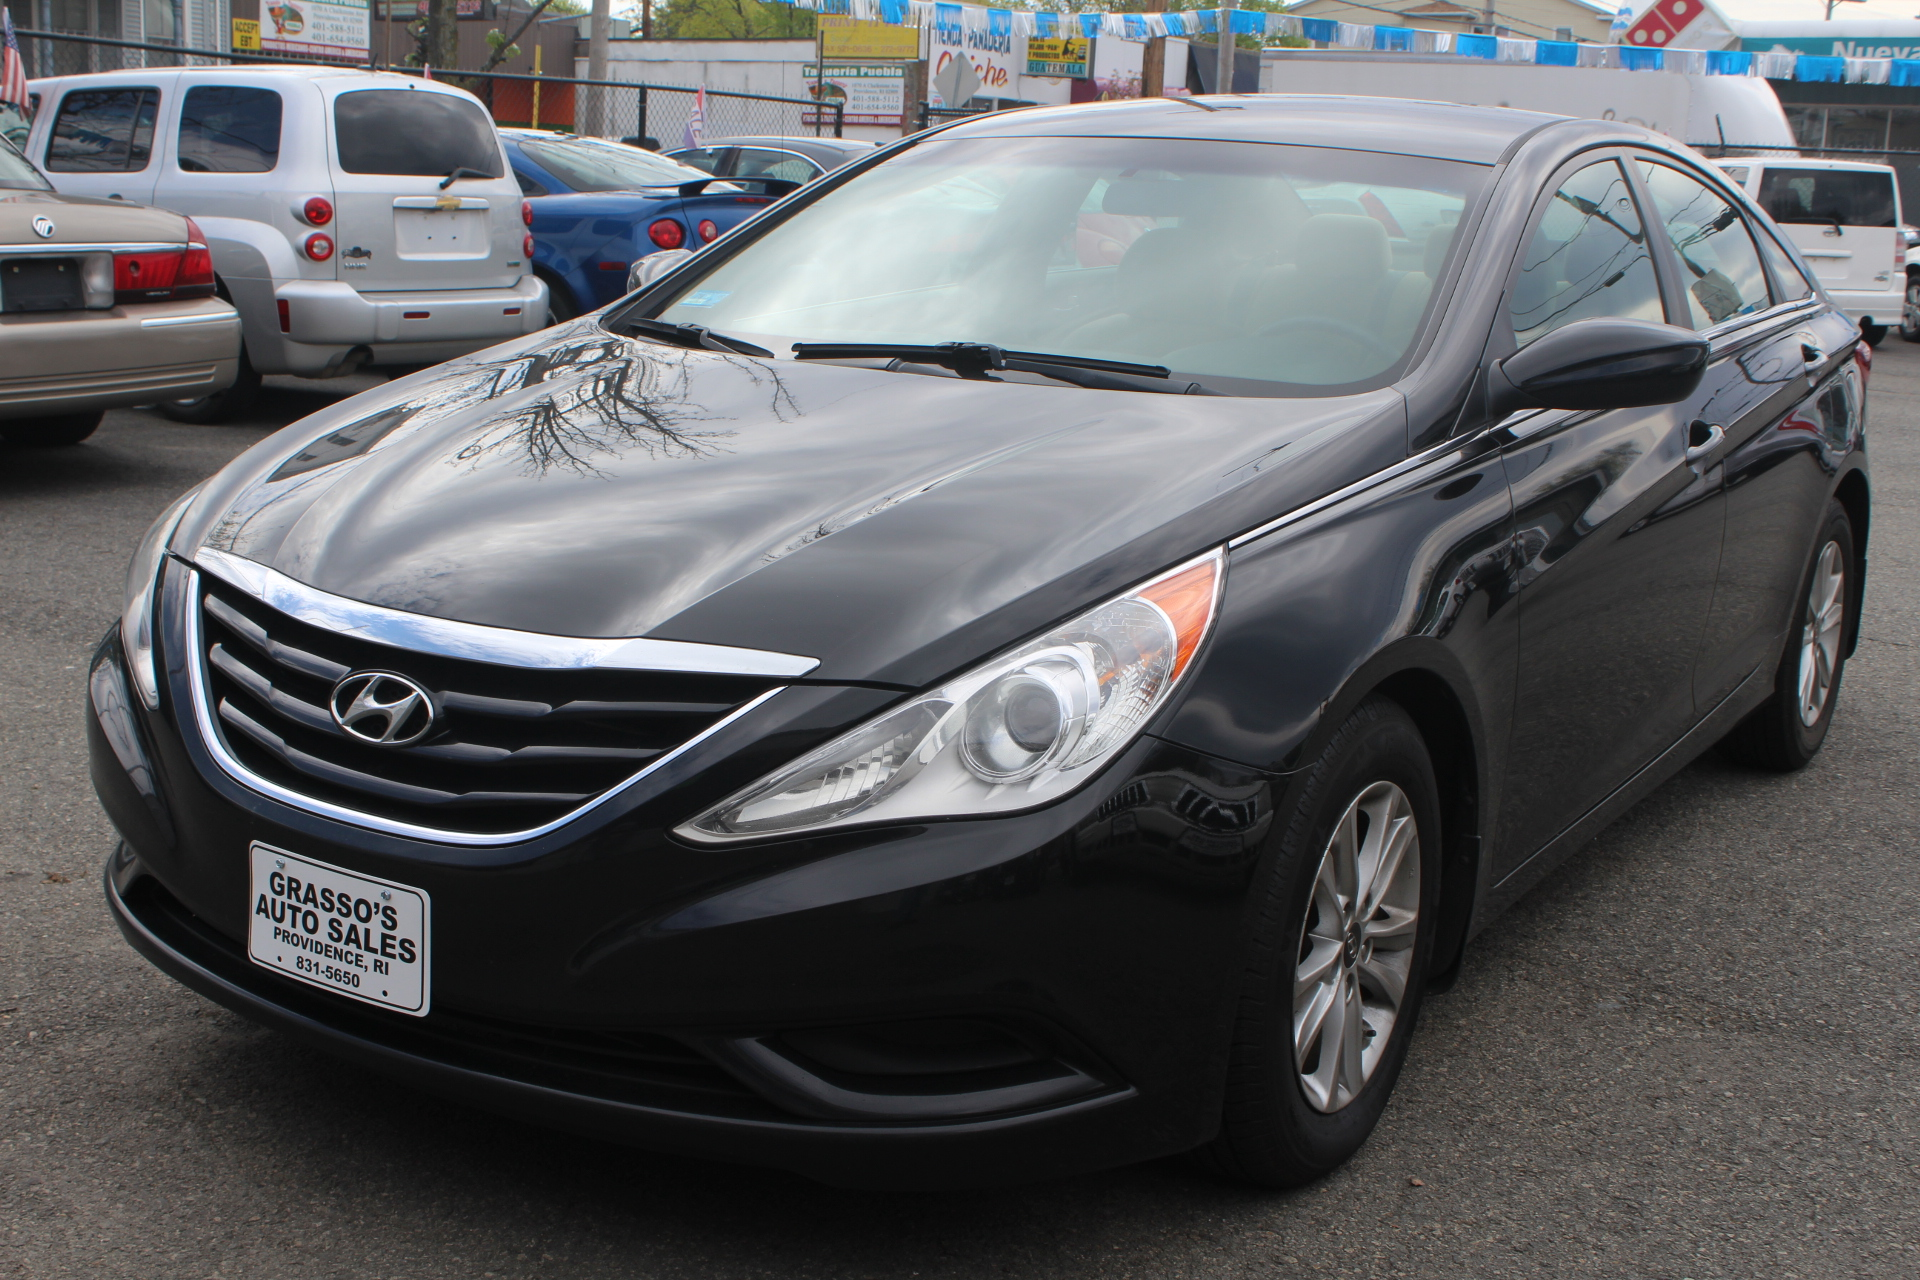 2011 Hyundai Sonata 4dr Sdn 24L Auto GLS Ltd Avail Hyundai has put longtime mid-size best-selle